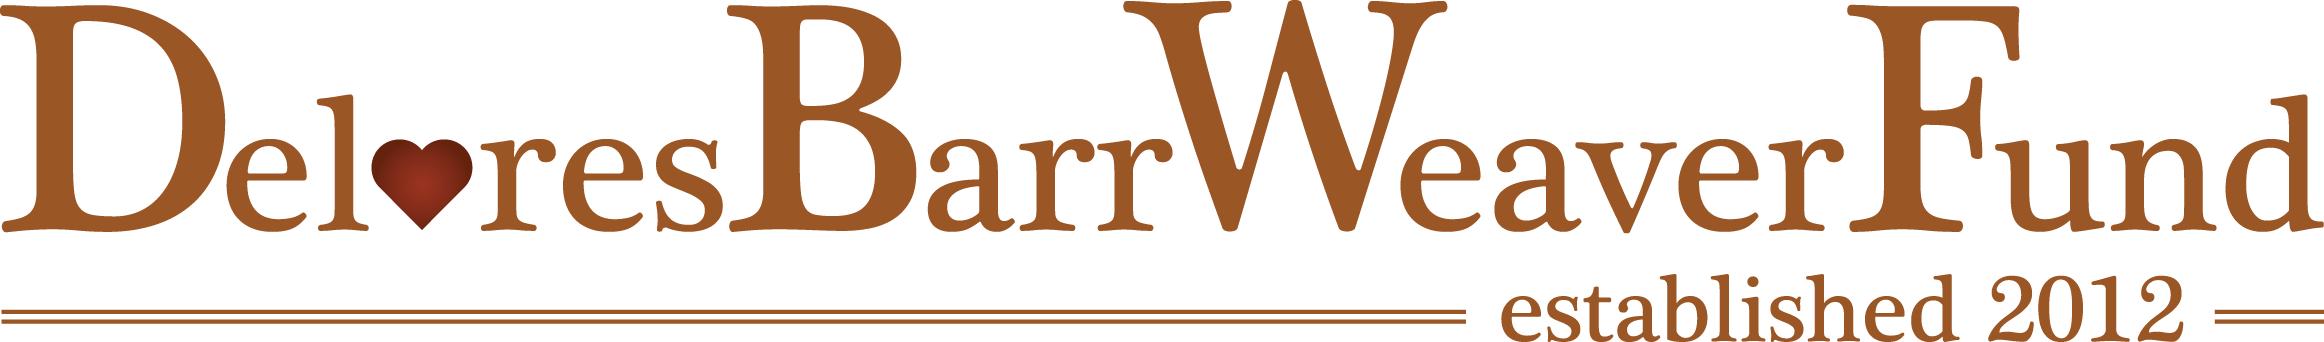 delores-barr-weaver.png